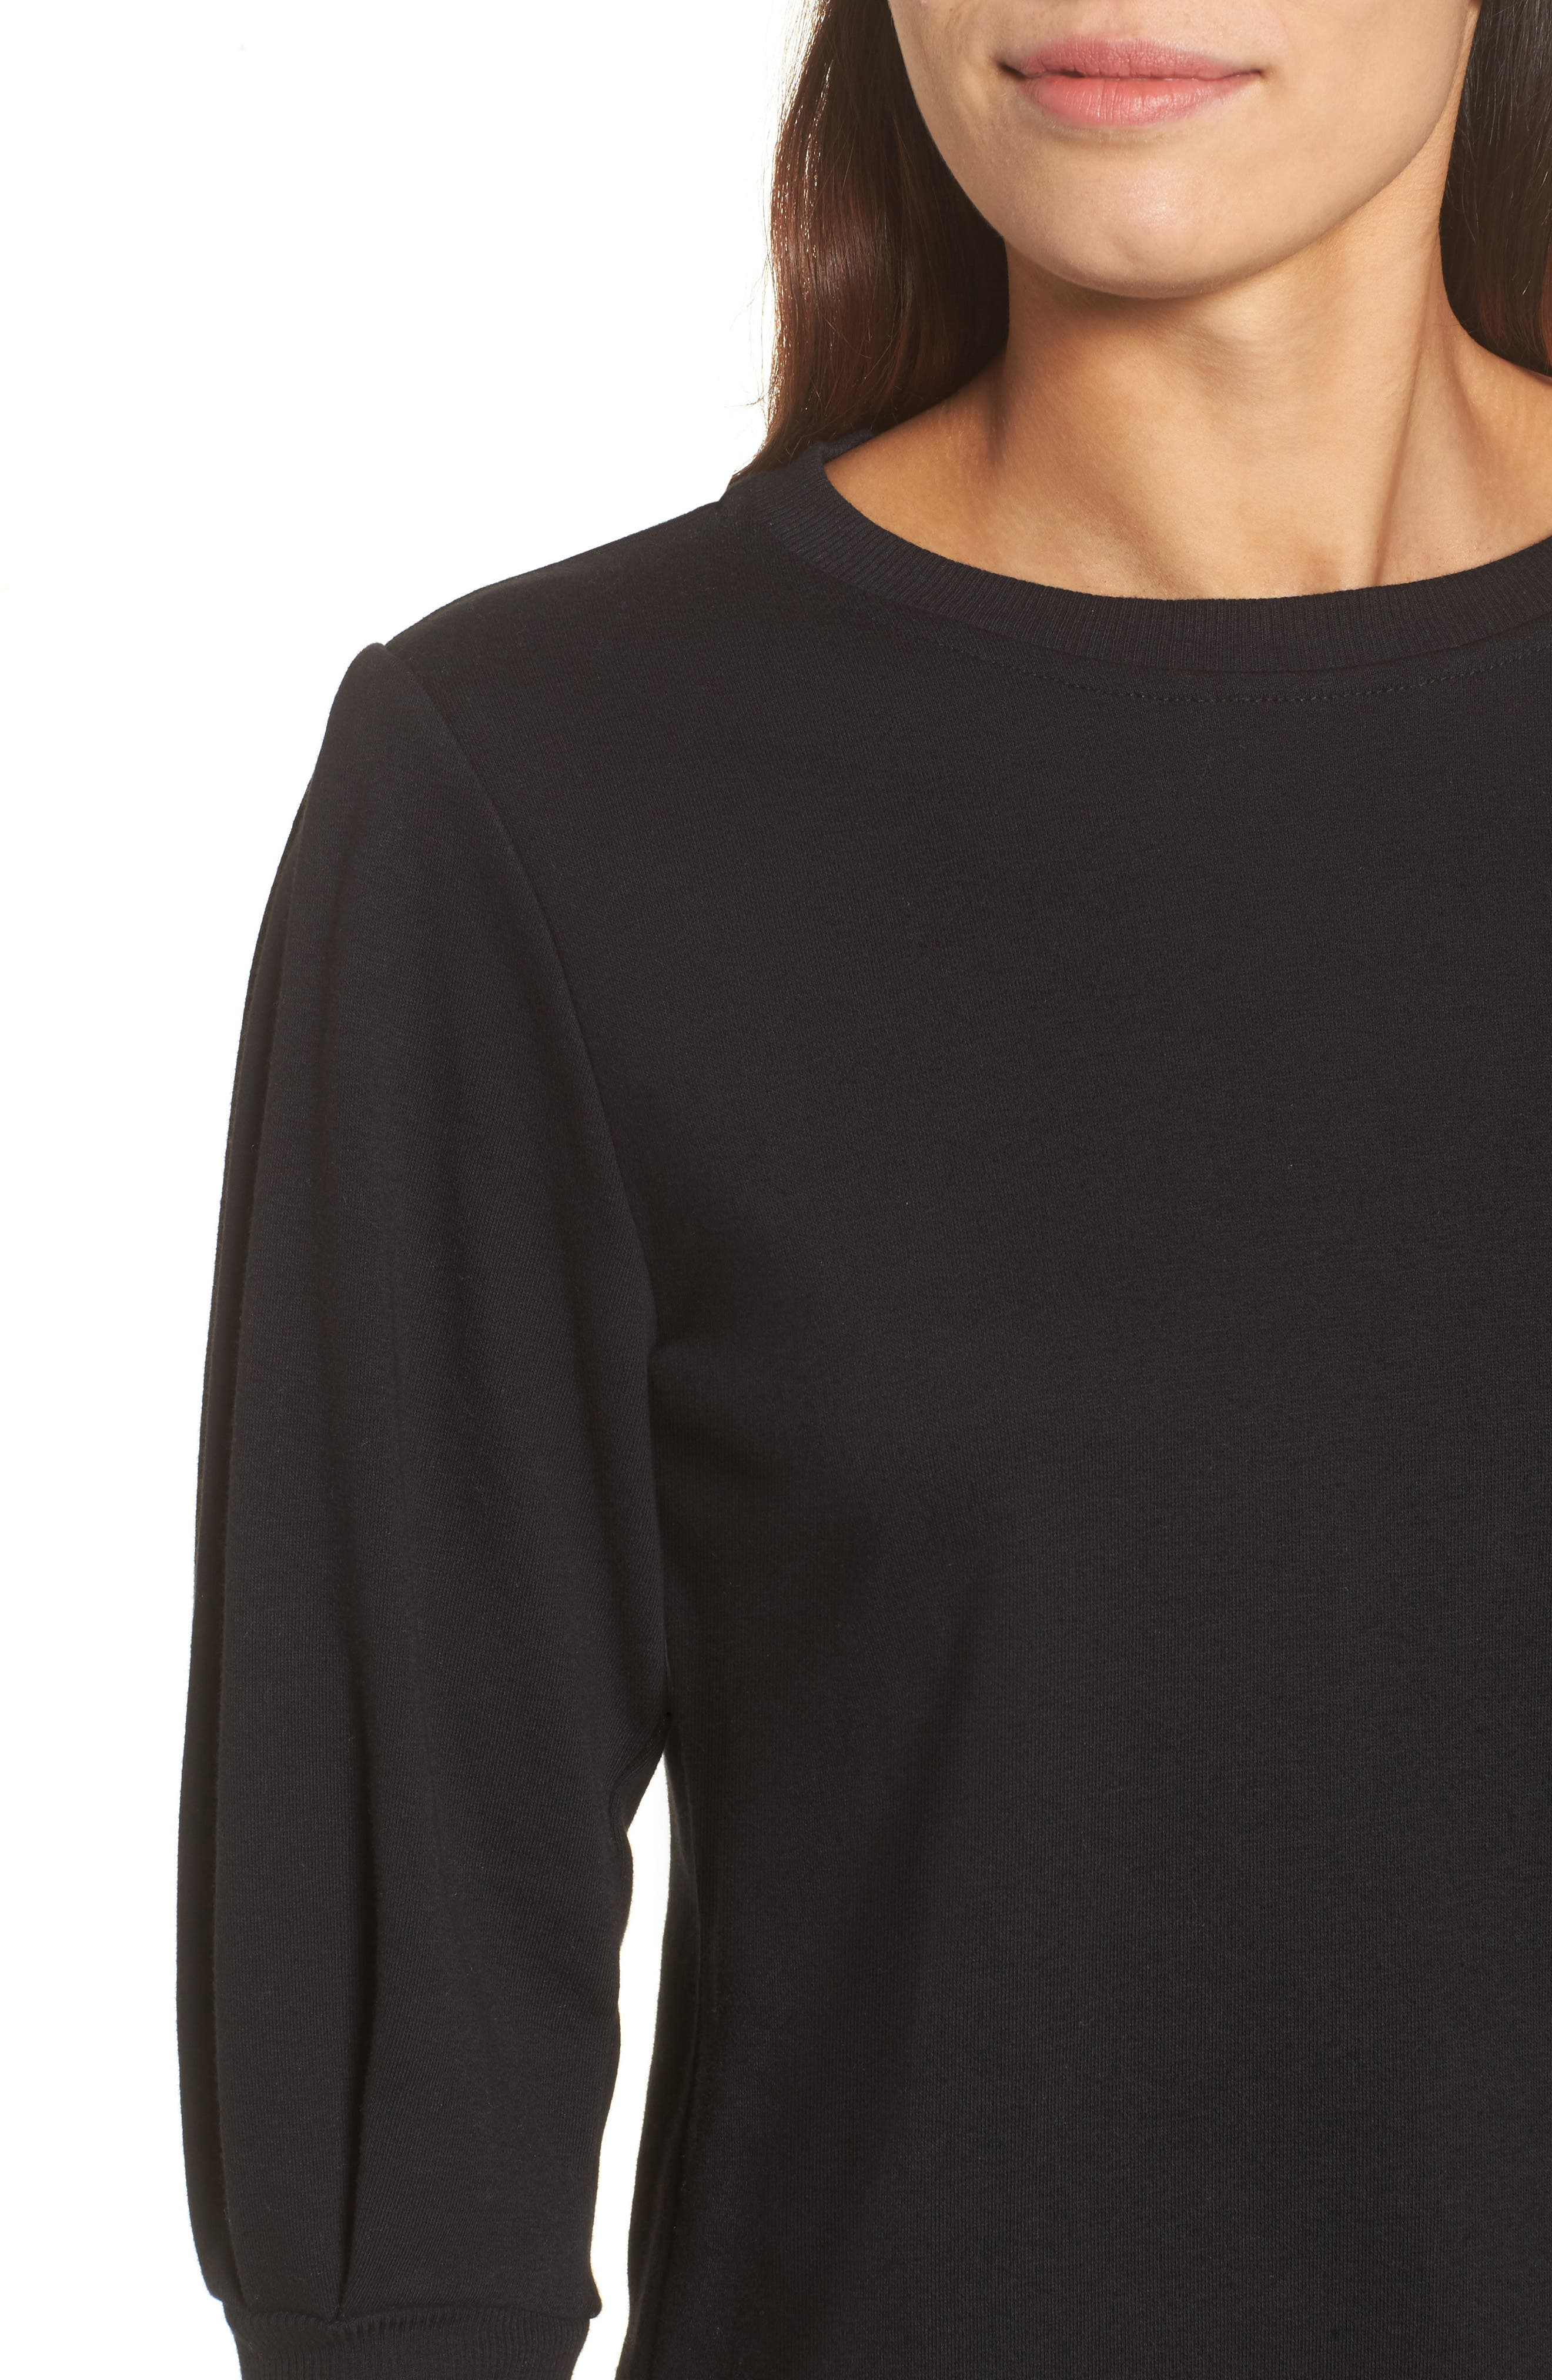 Blouson Sleeve Sweatshirt,                             Alternate thumbnail 4, color,                             001